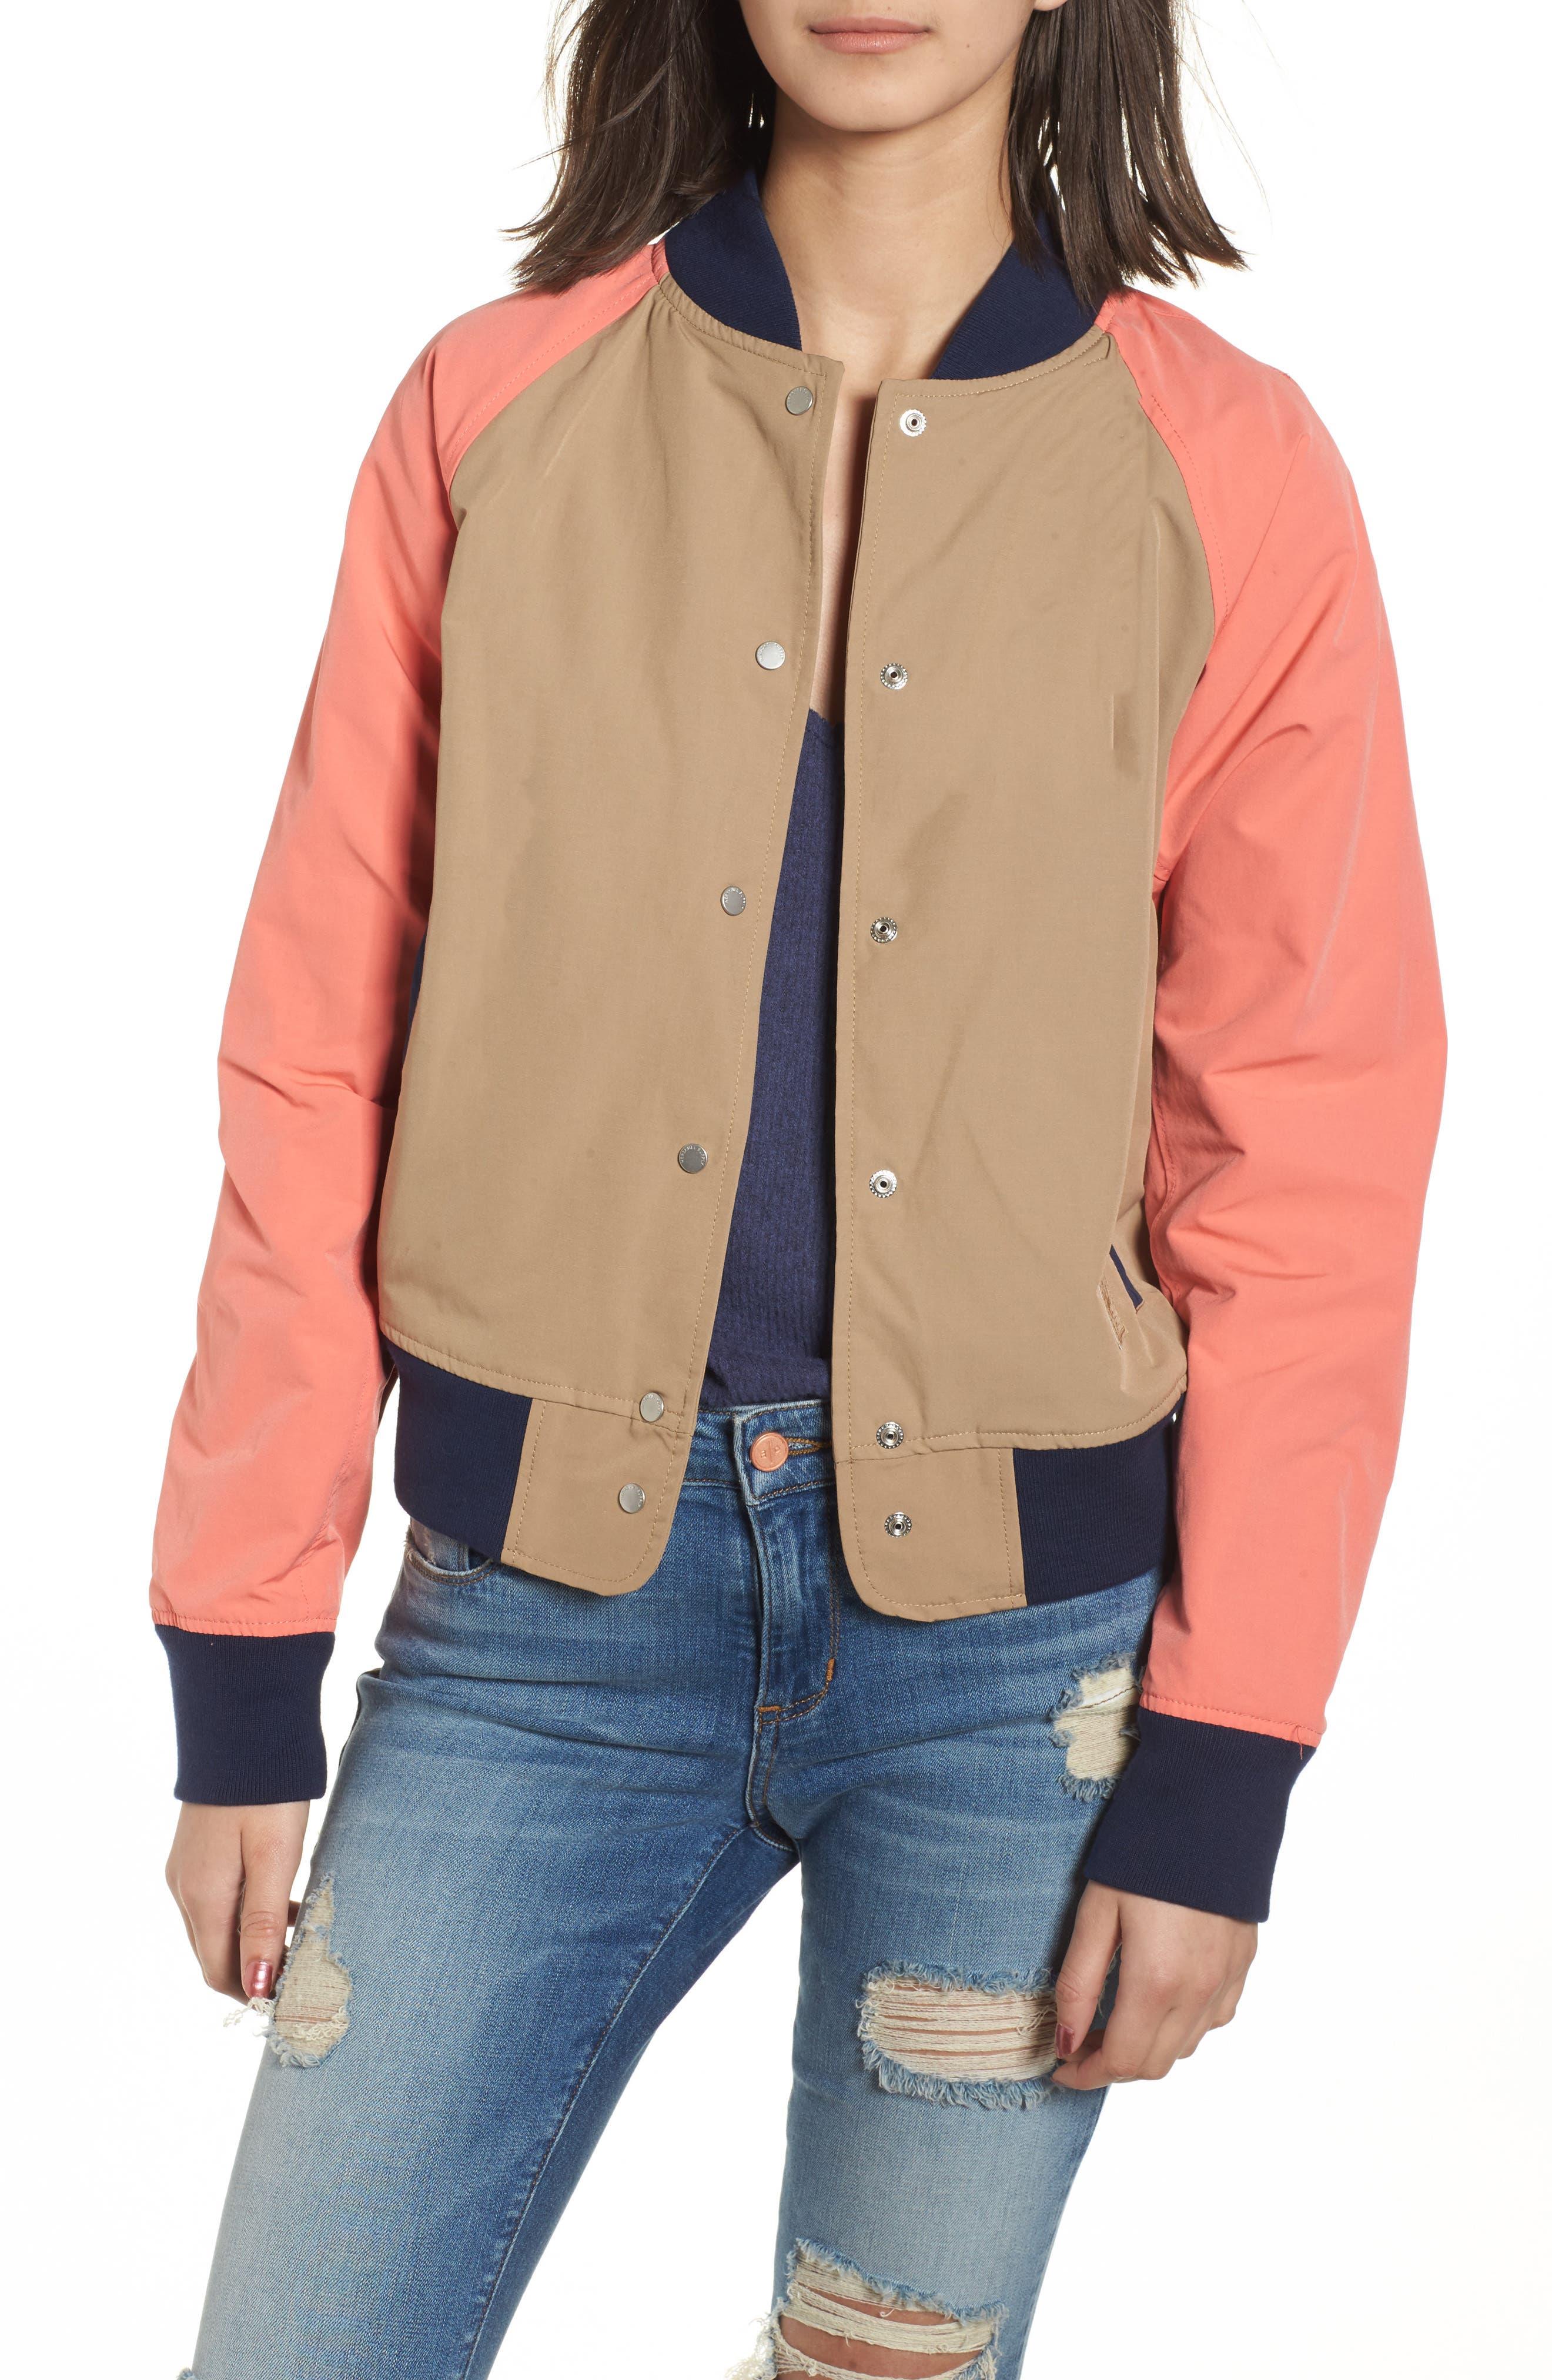 Alternate Image 1 Selected - Herschel Supply Co. Varsity Jacket